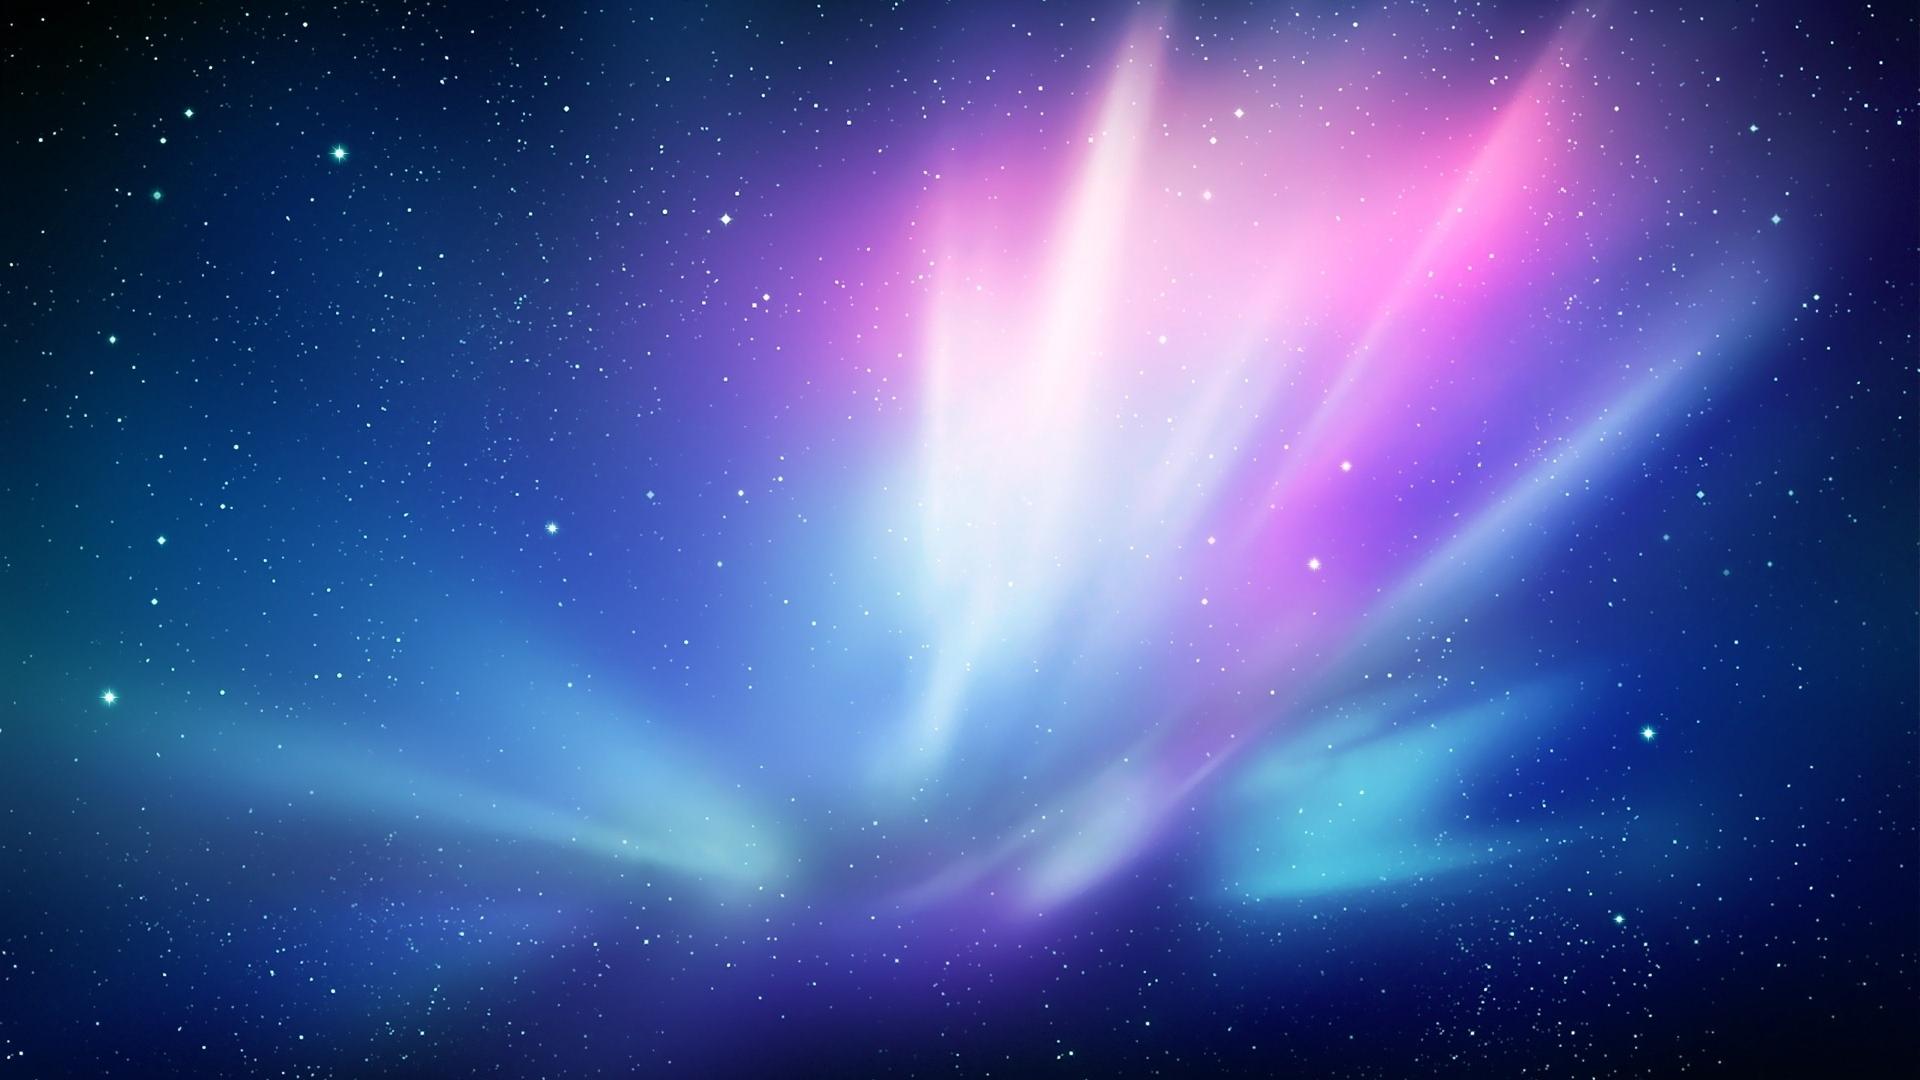 Download Wonderful purple blue galaxy wallpaper in Space wallpapers 1920x1080